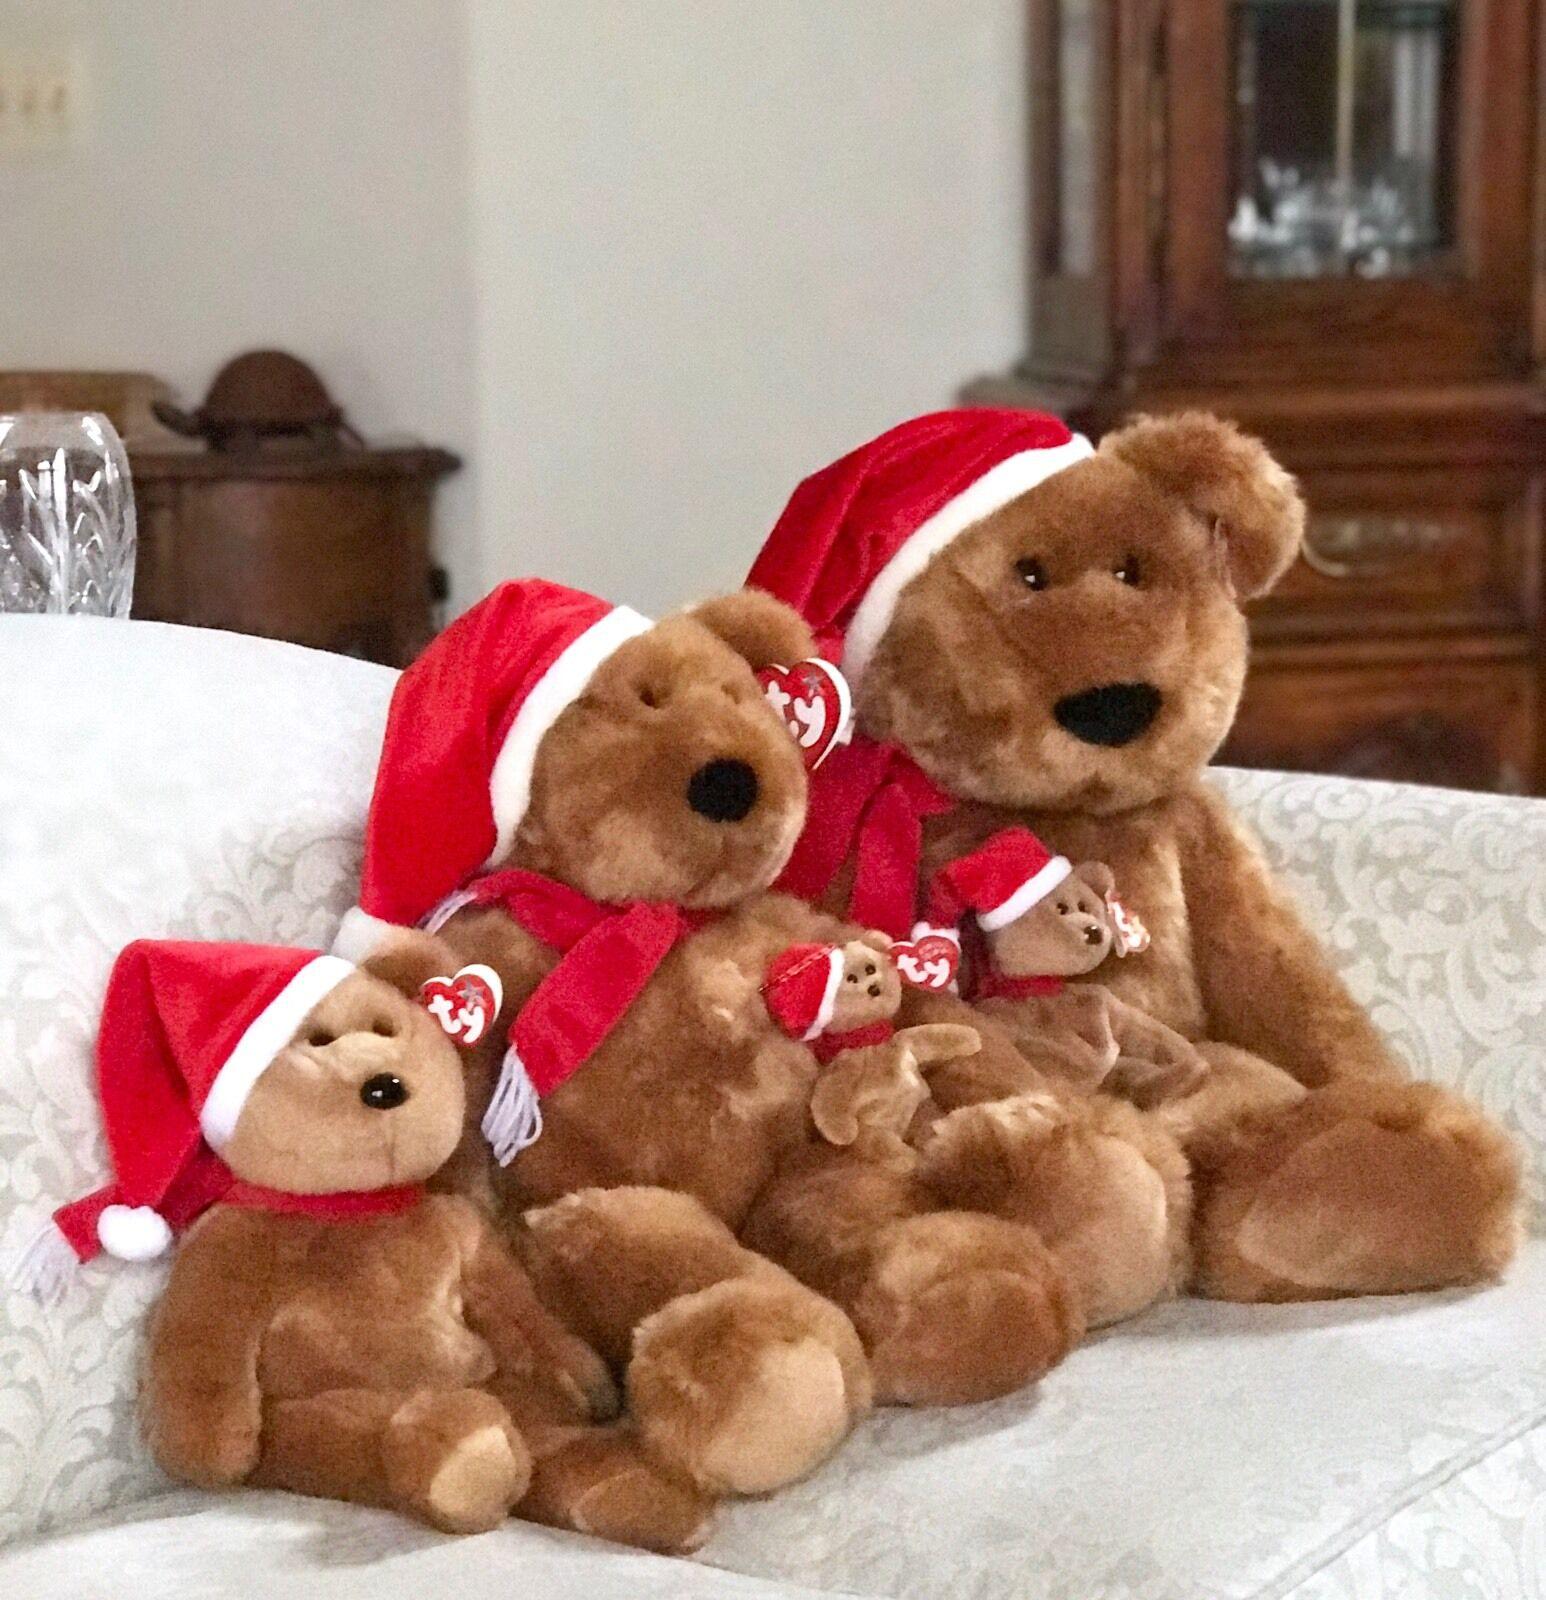 NEW MINT TY Five (5) Sizes 1997 HOLIDAY TEDDY BEANIE BABIES   BUDDIES   JINGLES